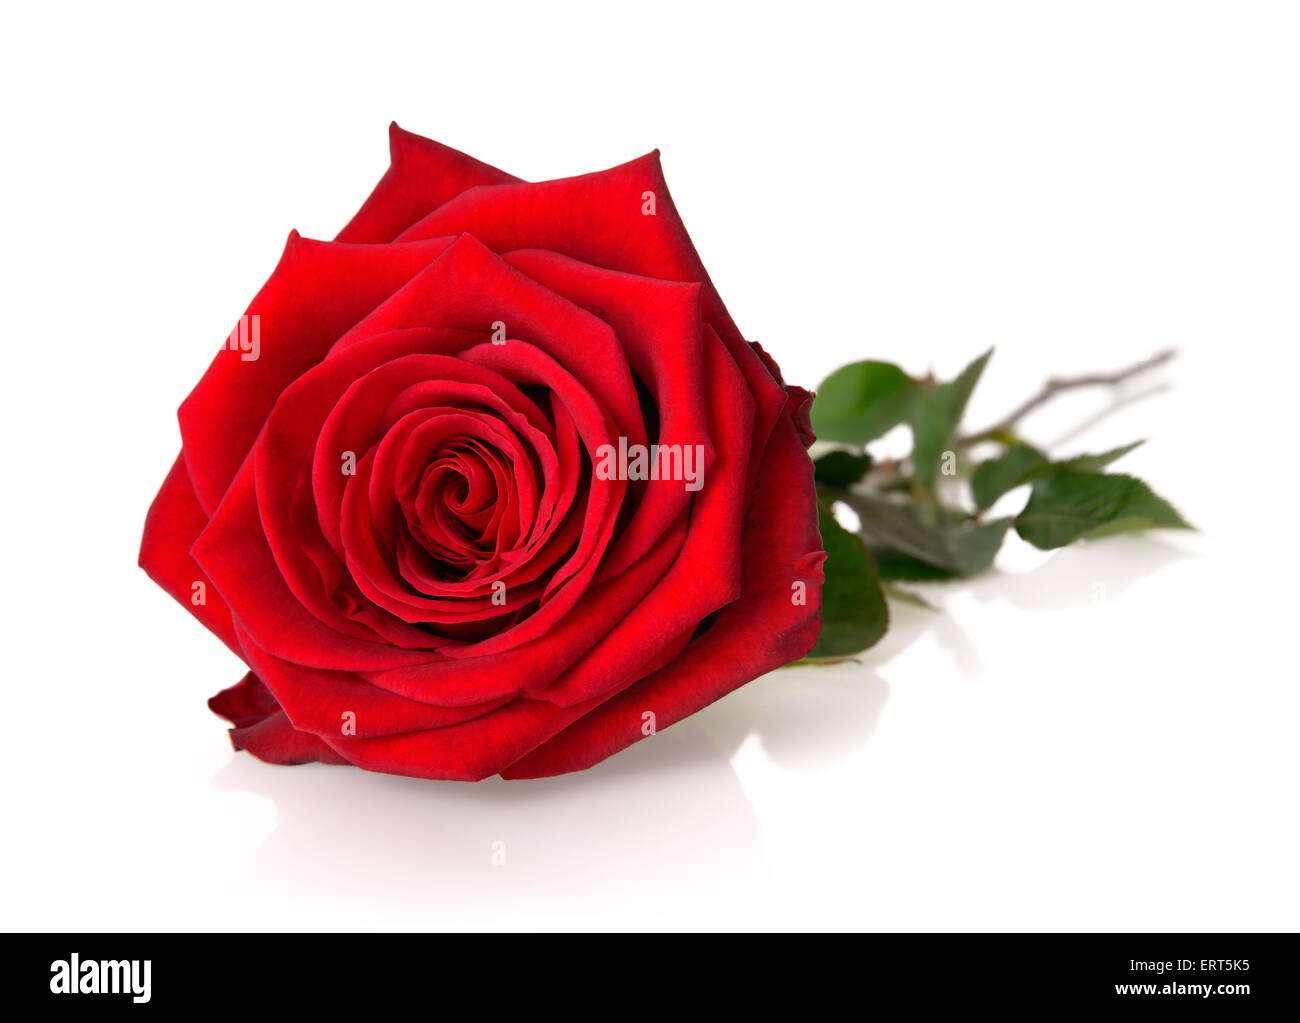 Pienamente Sbocciato Splendida Rosa Rossa Con Stelo E Foglie Su